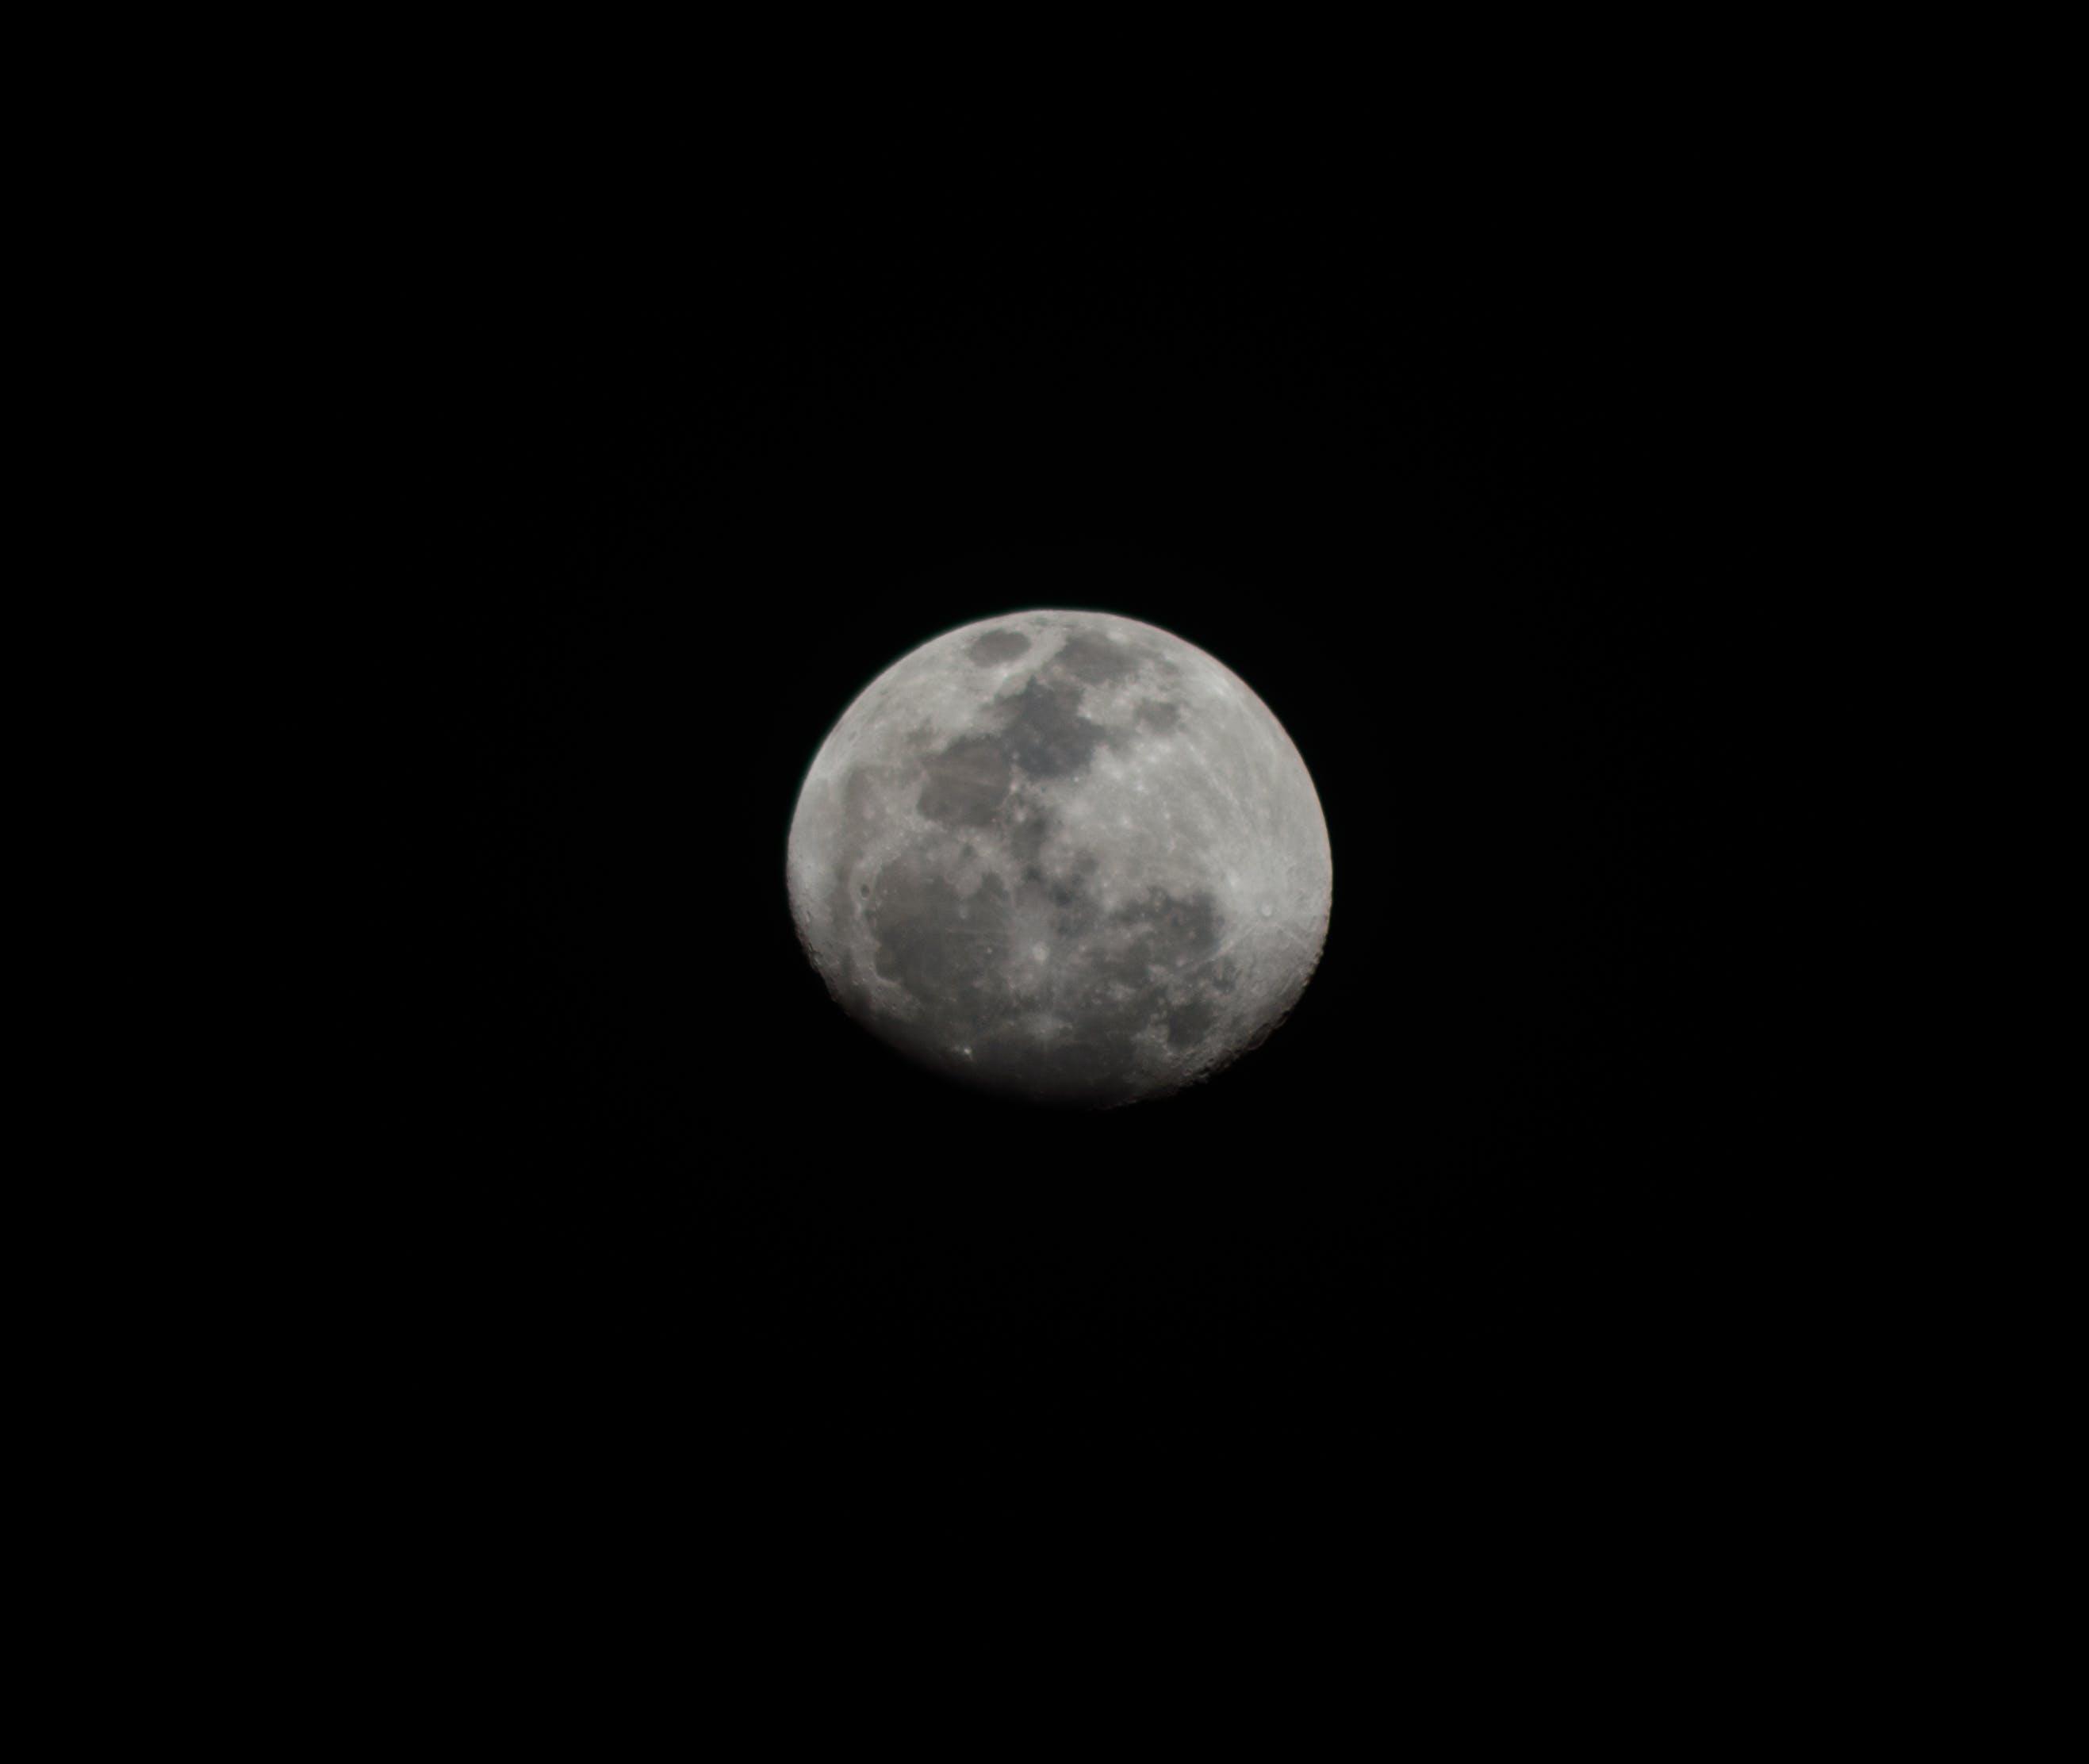 Free stock photo of moon, telescope, zoom lens